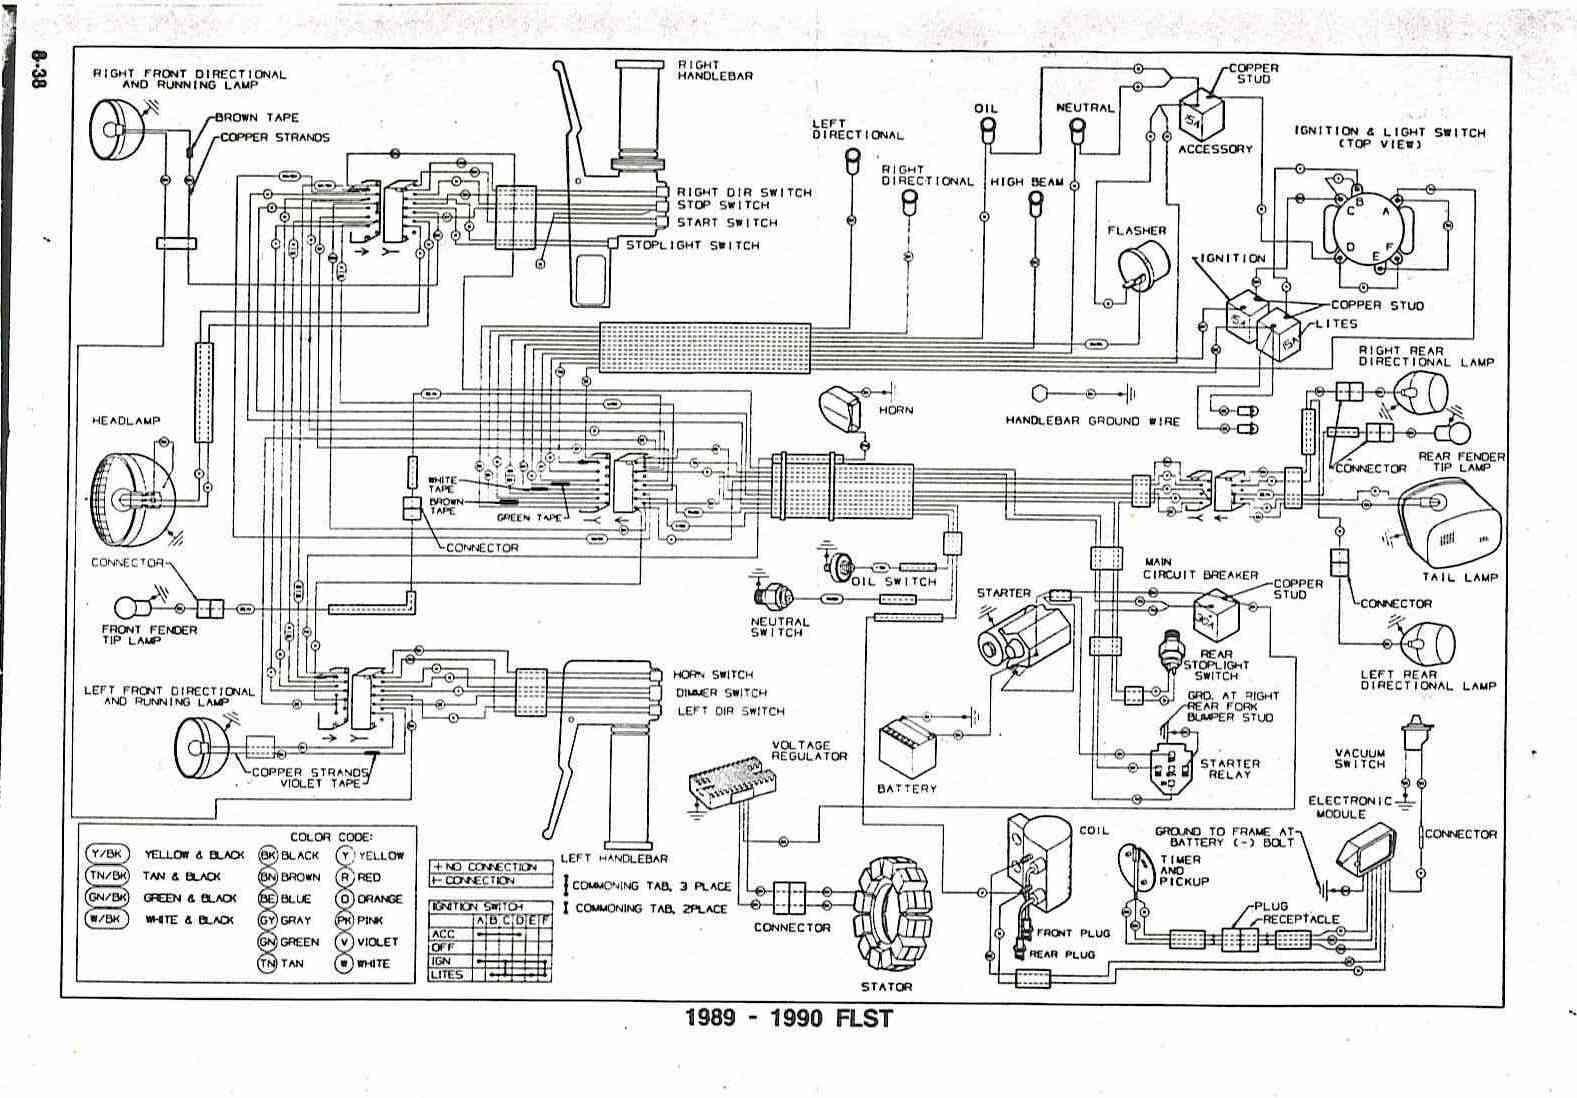 1990 Harley Fxrs Wiring Diagram | Wiring Diagram on harley fxr headlight, harley fxr clutch, harley fxr wheels, harley fxr exhaust, harley fxr engine, harley fxr frame, buell wiring diagram, harley fxr seats, harley fxr parts, harley fxr dimensions, harley fxr speedometer, harley handle bar wiring diagrams, harley fxr transmission, fatboy wiring diagram, harley fxr fuse,